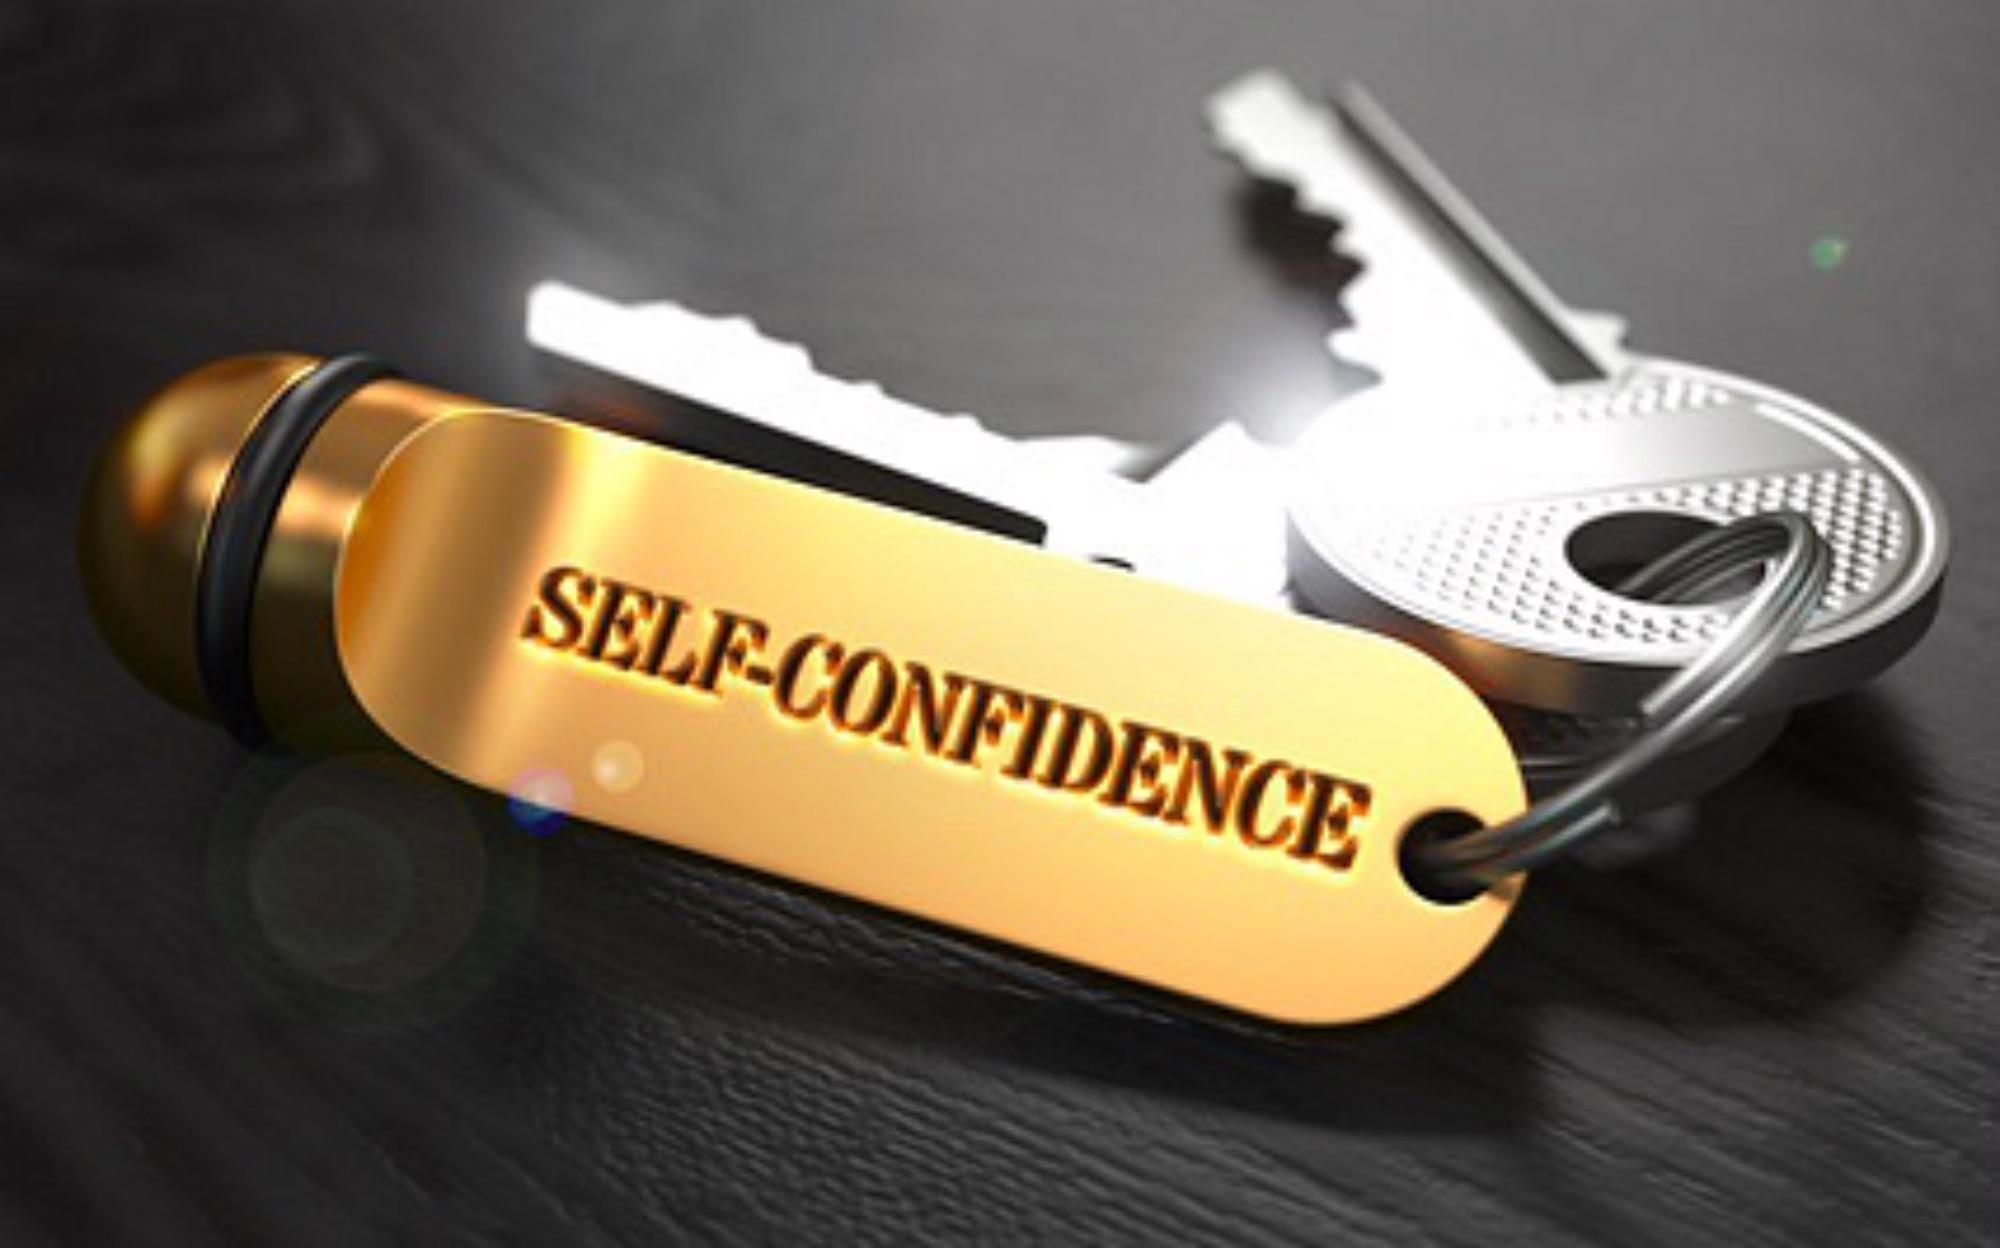 Bescherm je zelfvertrouwen.